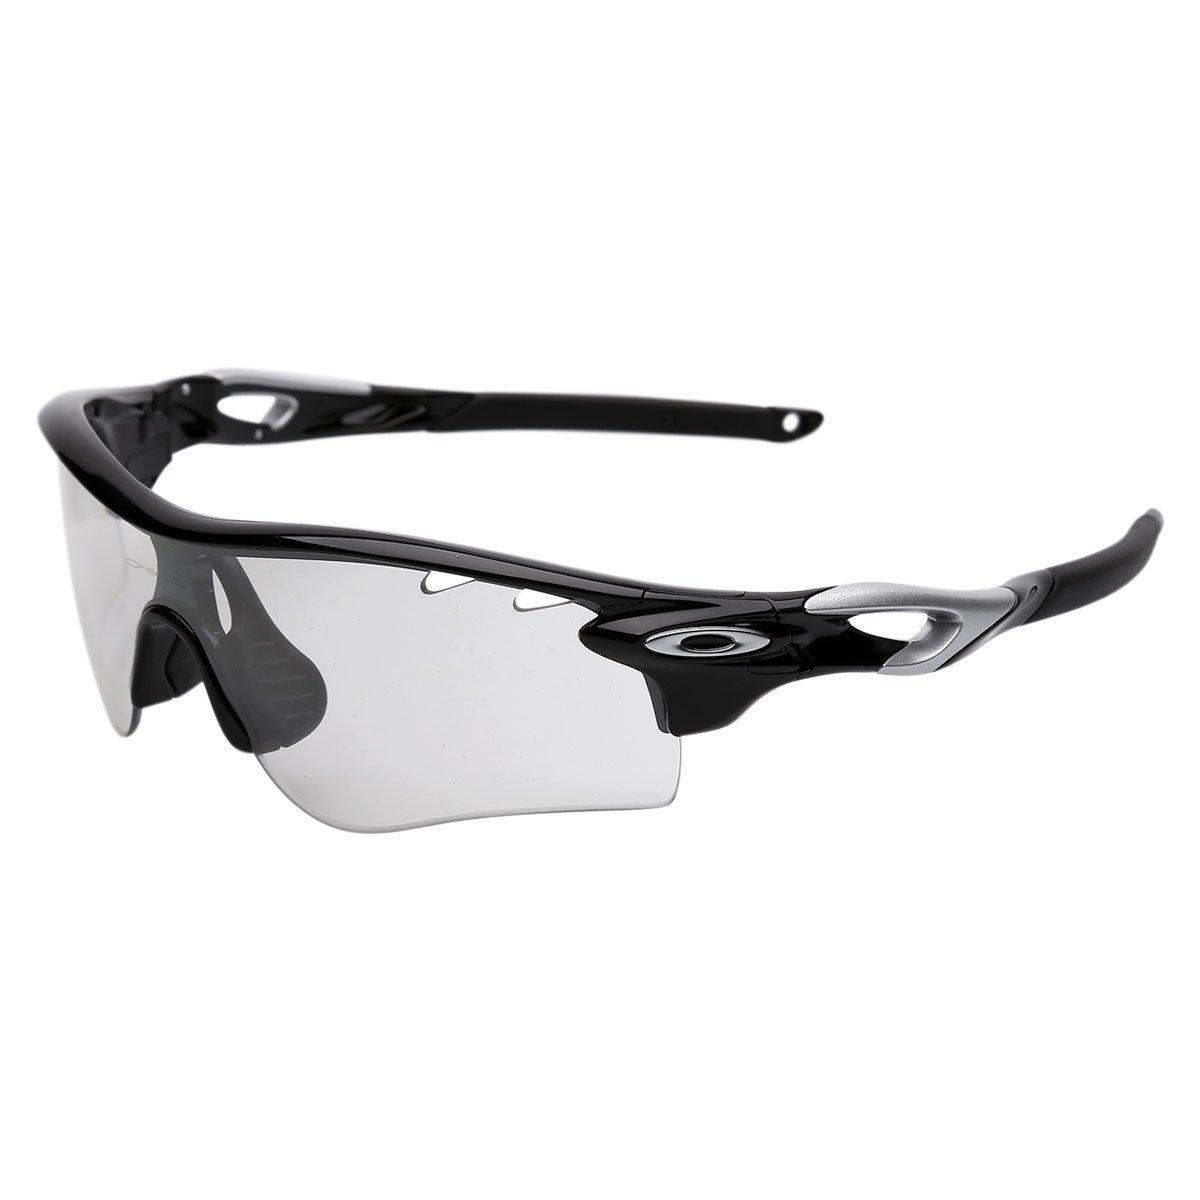 Óculos Oakley Radarlock Path - Iridum Photocromic Vented - Compre Agora  972f7f73c619f